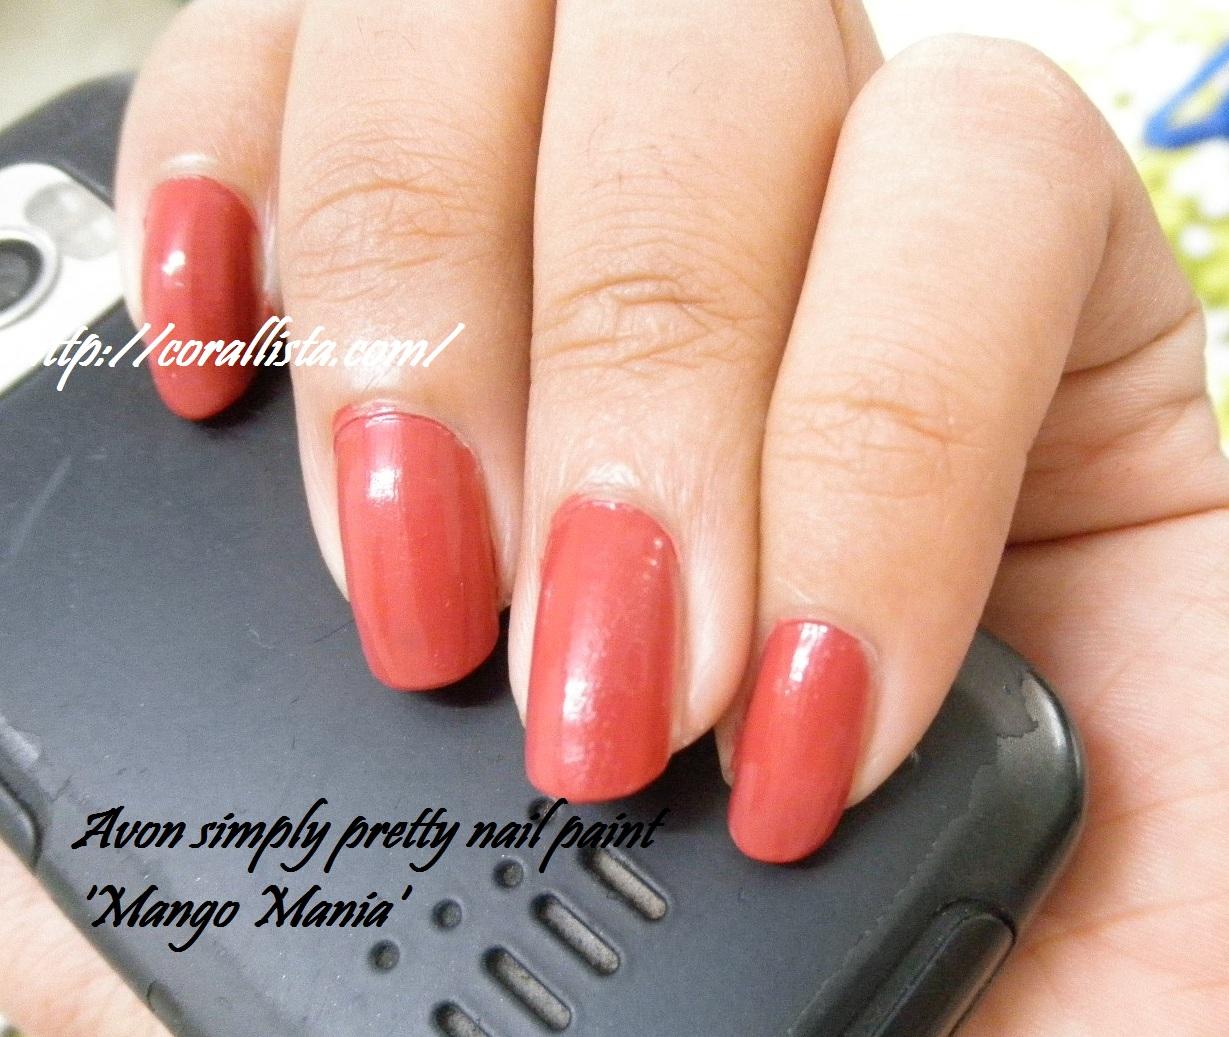 Finger Nail Paint: Nail Of The Day : Avon Simply Pretty Nail Paint 'Mango